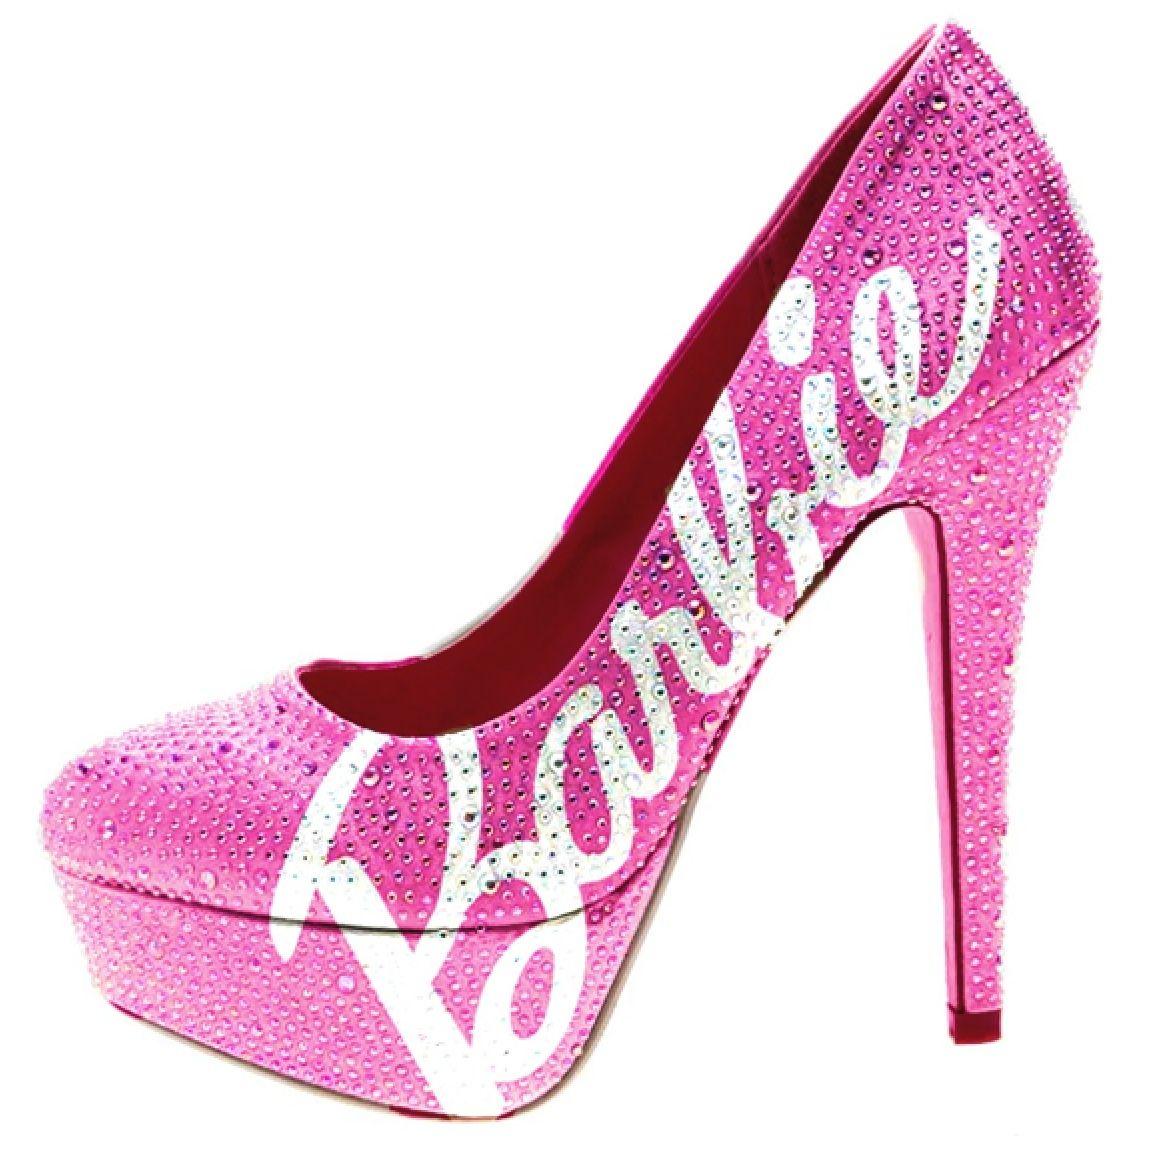 Haha! I used to love anything Barbie!